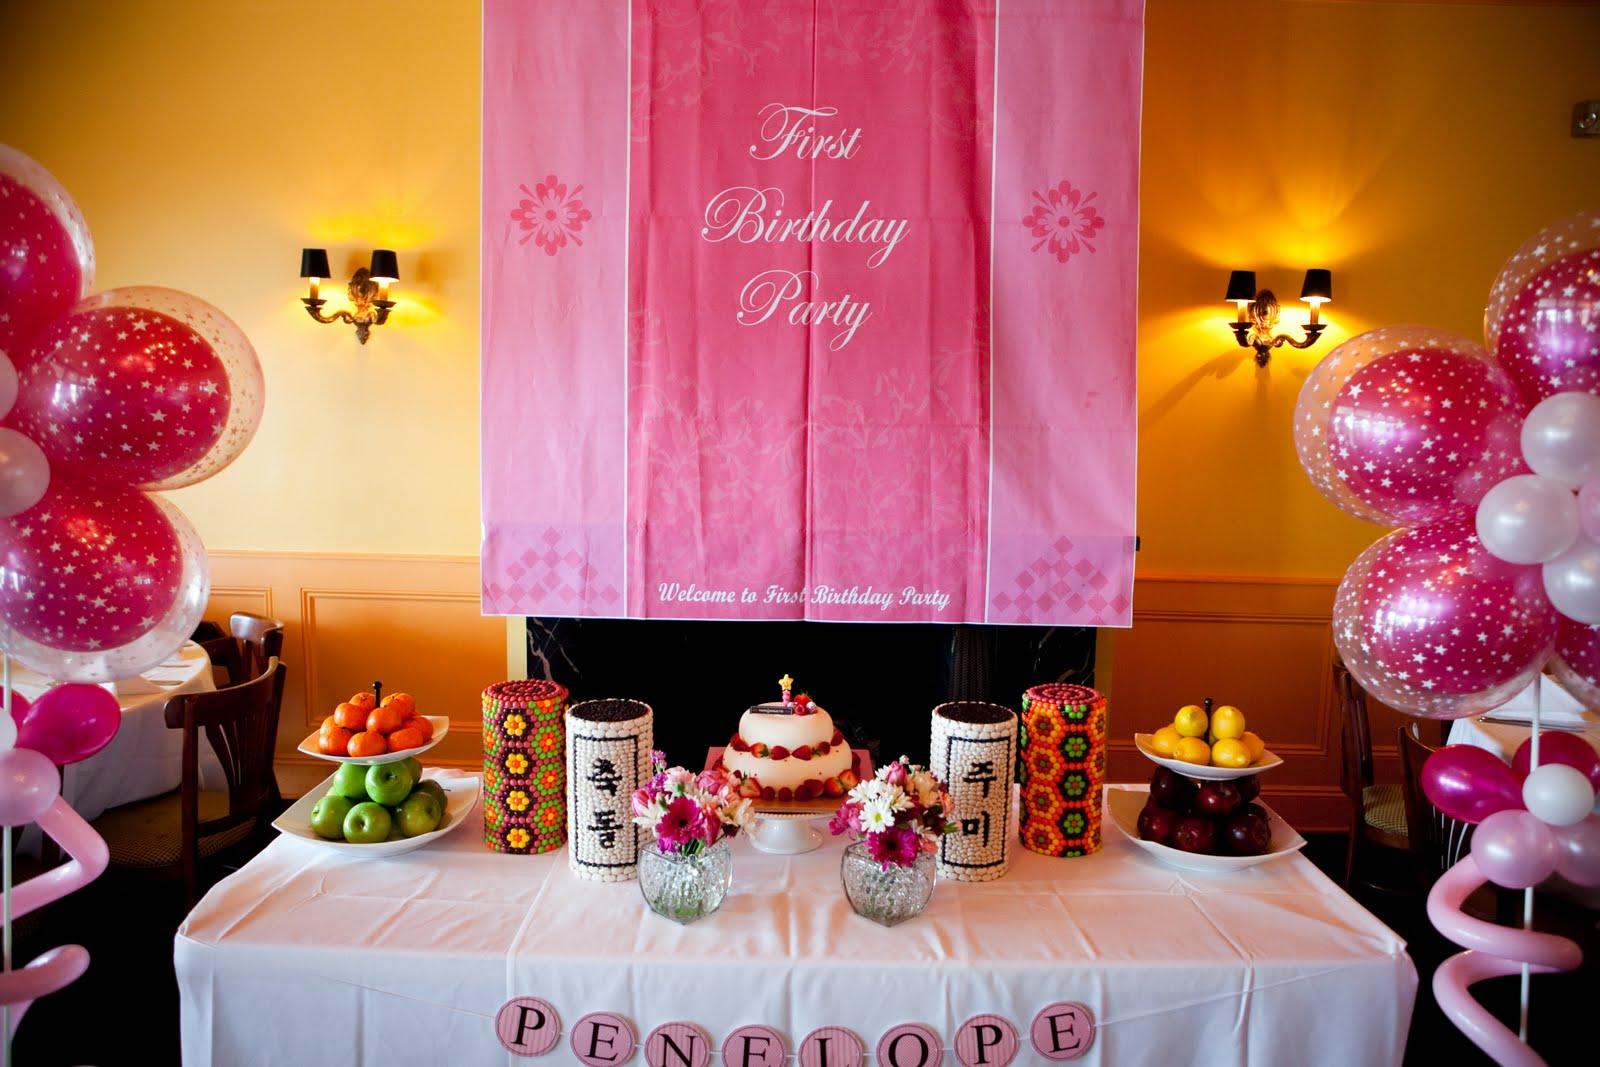 MiWonderings: My Daughter's 1st Birthday (